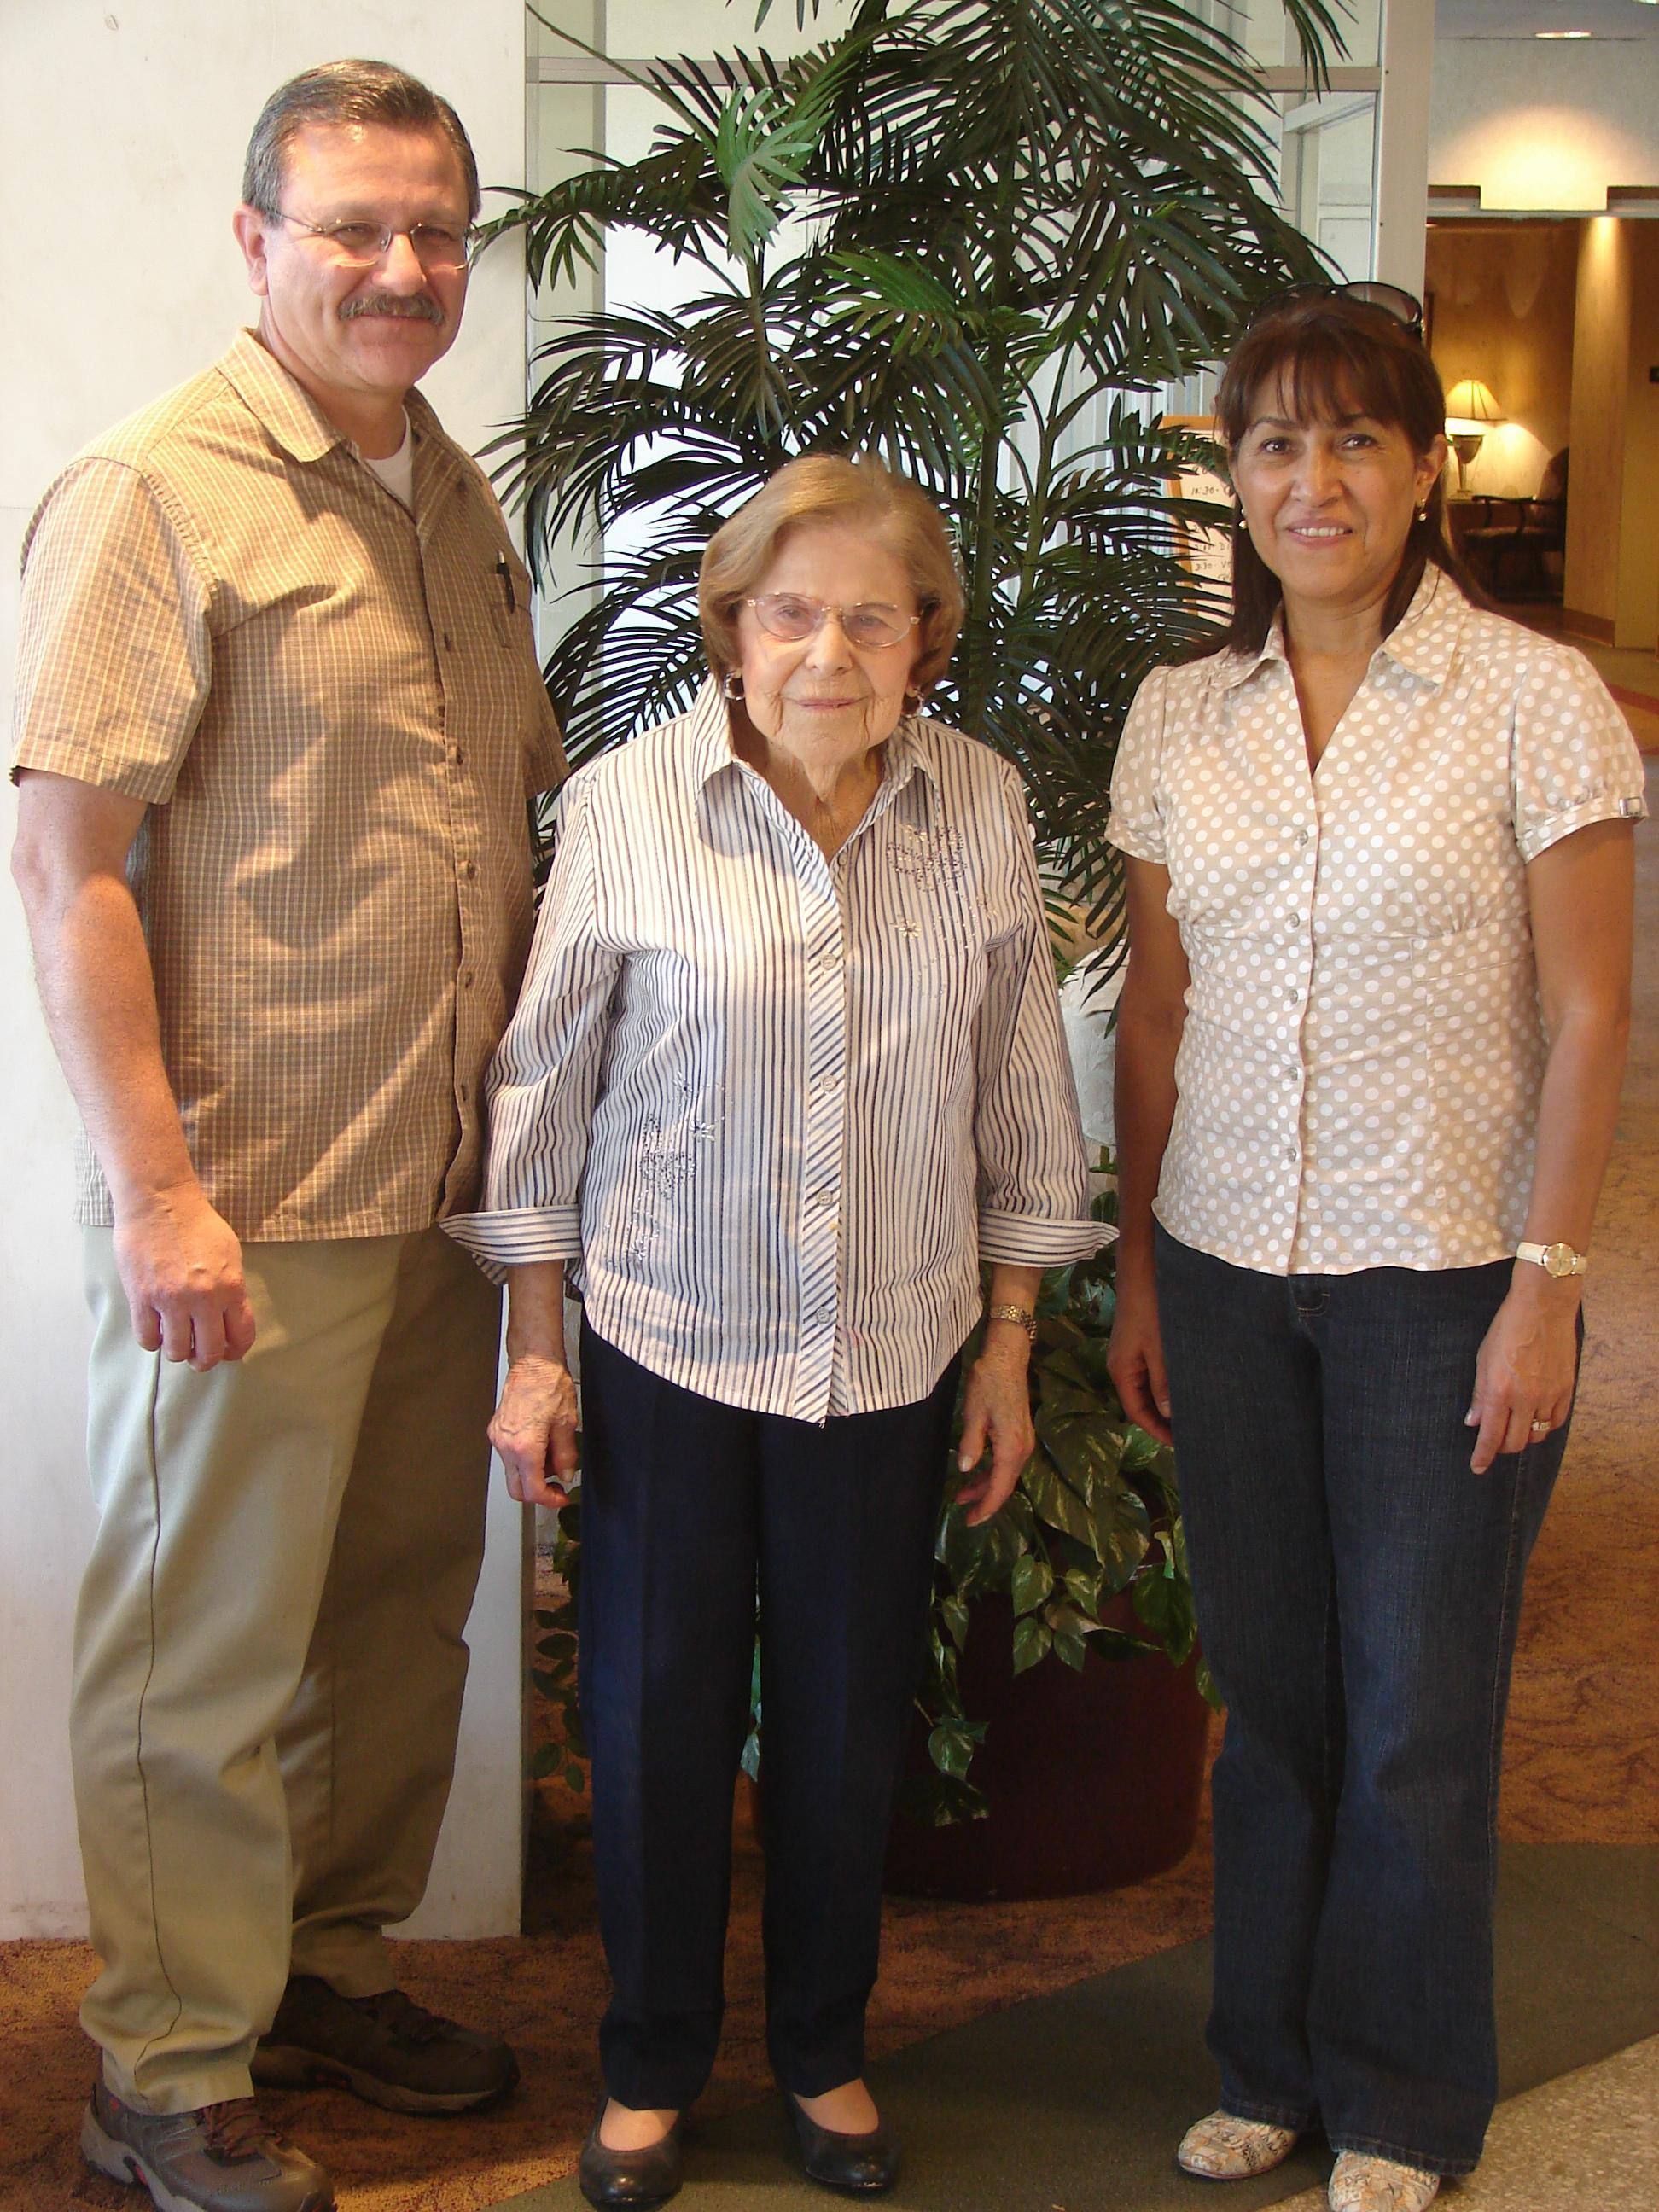 Mr. Garcia, Librarian and his wife meet Esther Struman